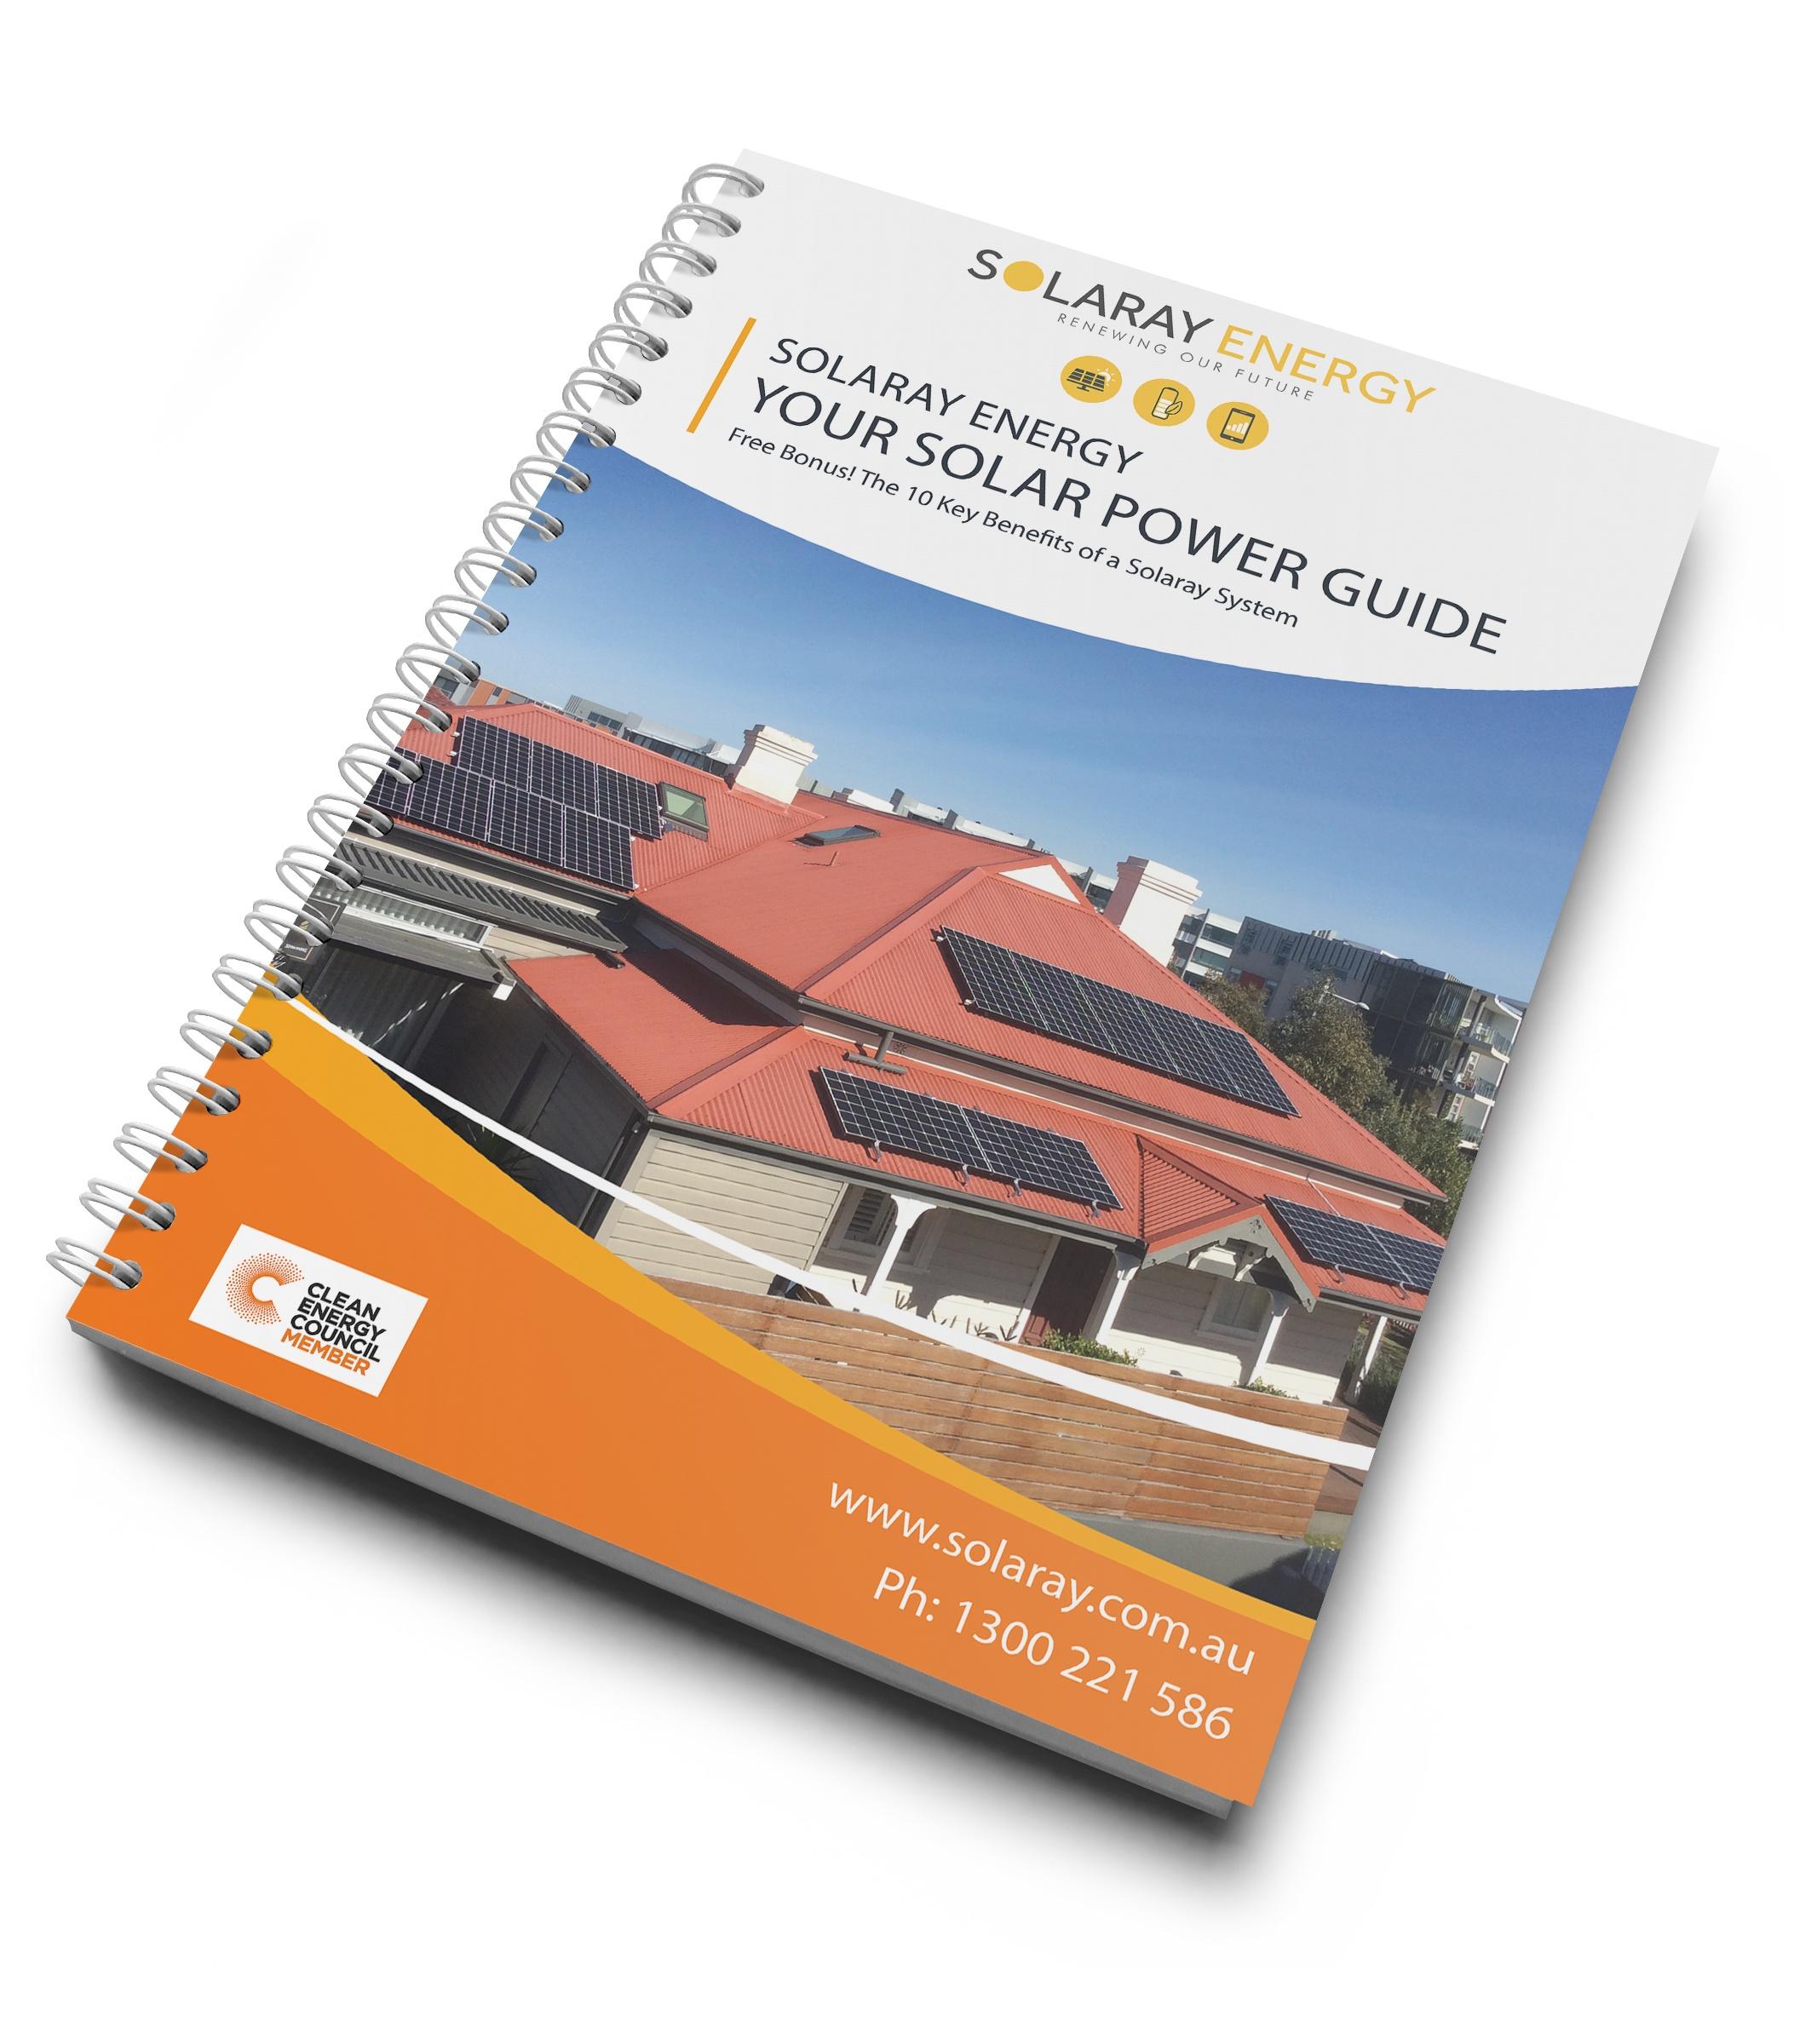 Solaray Solar Power Guide Web-1